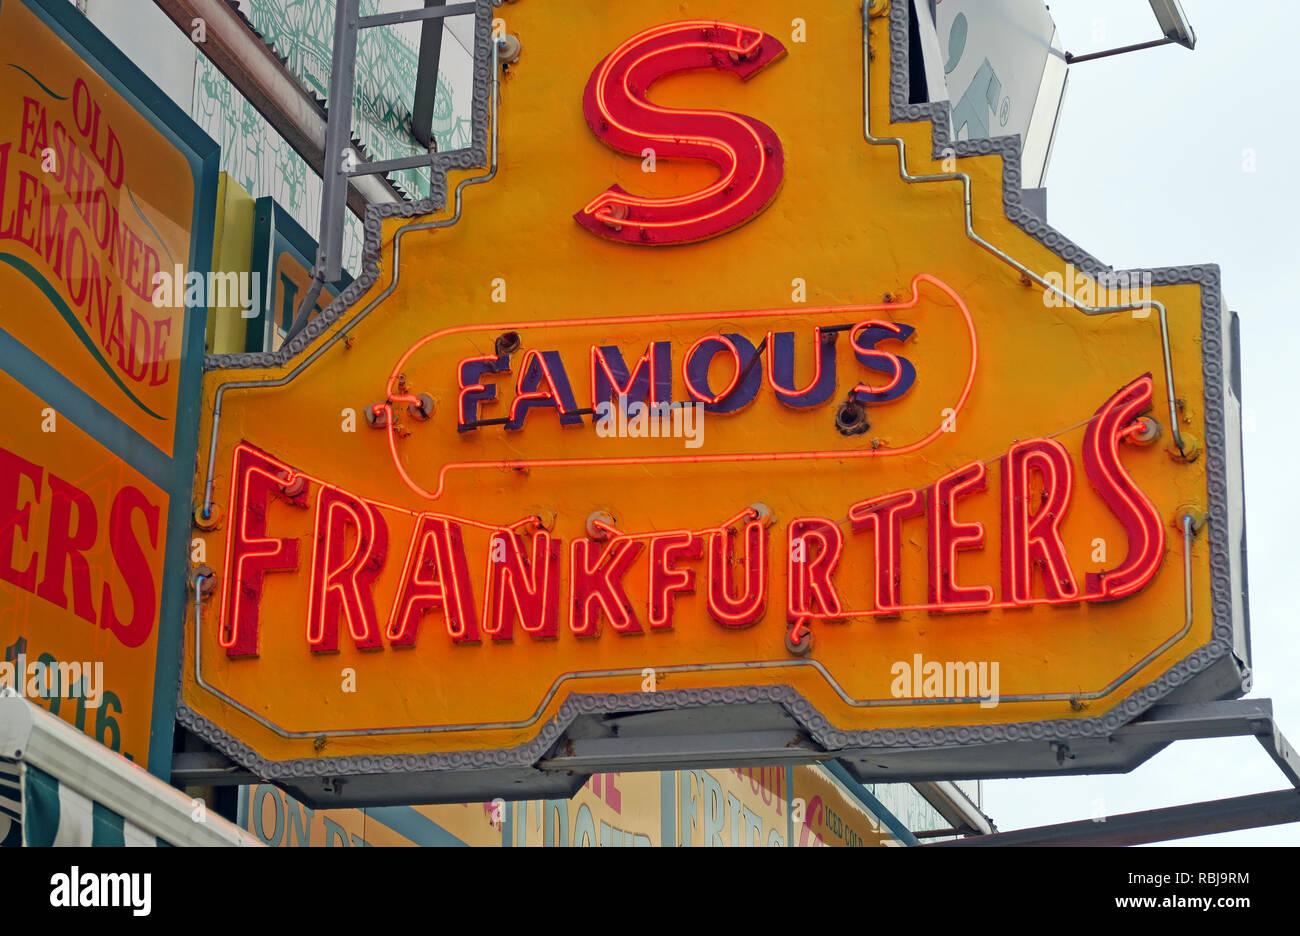 Laden Sie dieses Alamy Stockfoto Nathans Handwerker berühmten Würstchen Frankfurter Original Restaurant, Deli, Fast Food, Coney Island, im Stadtbezirk Brooklyn, New York, NY, USA - RBJ9RM